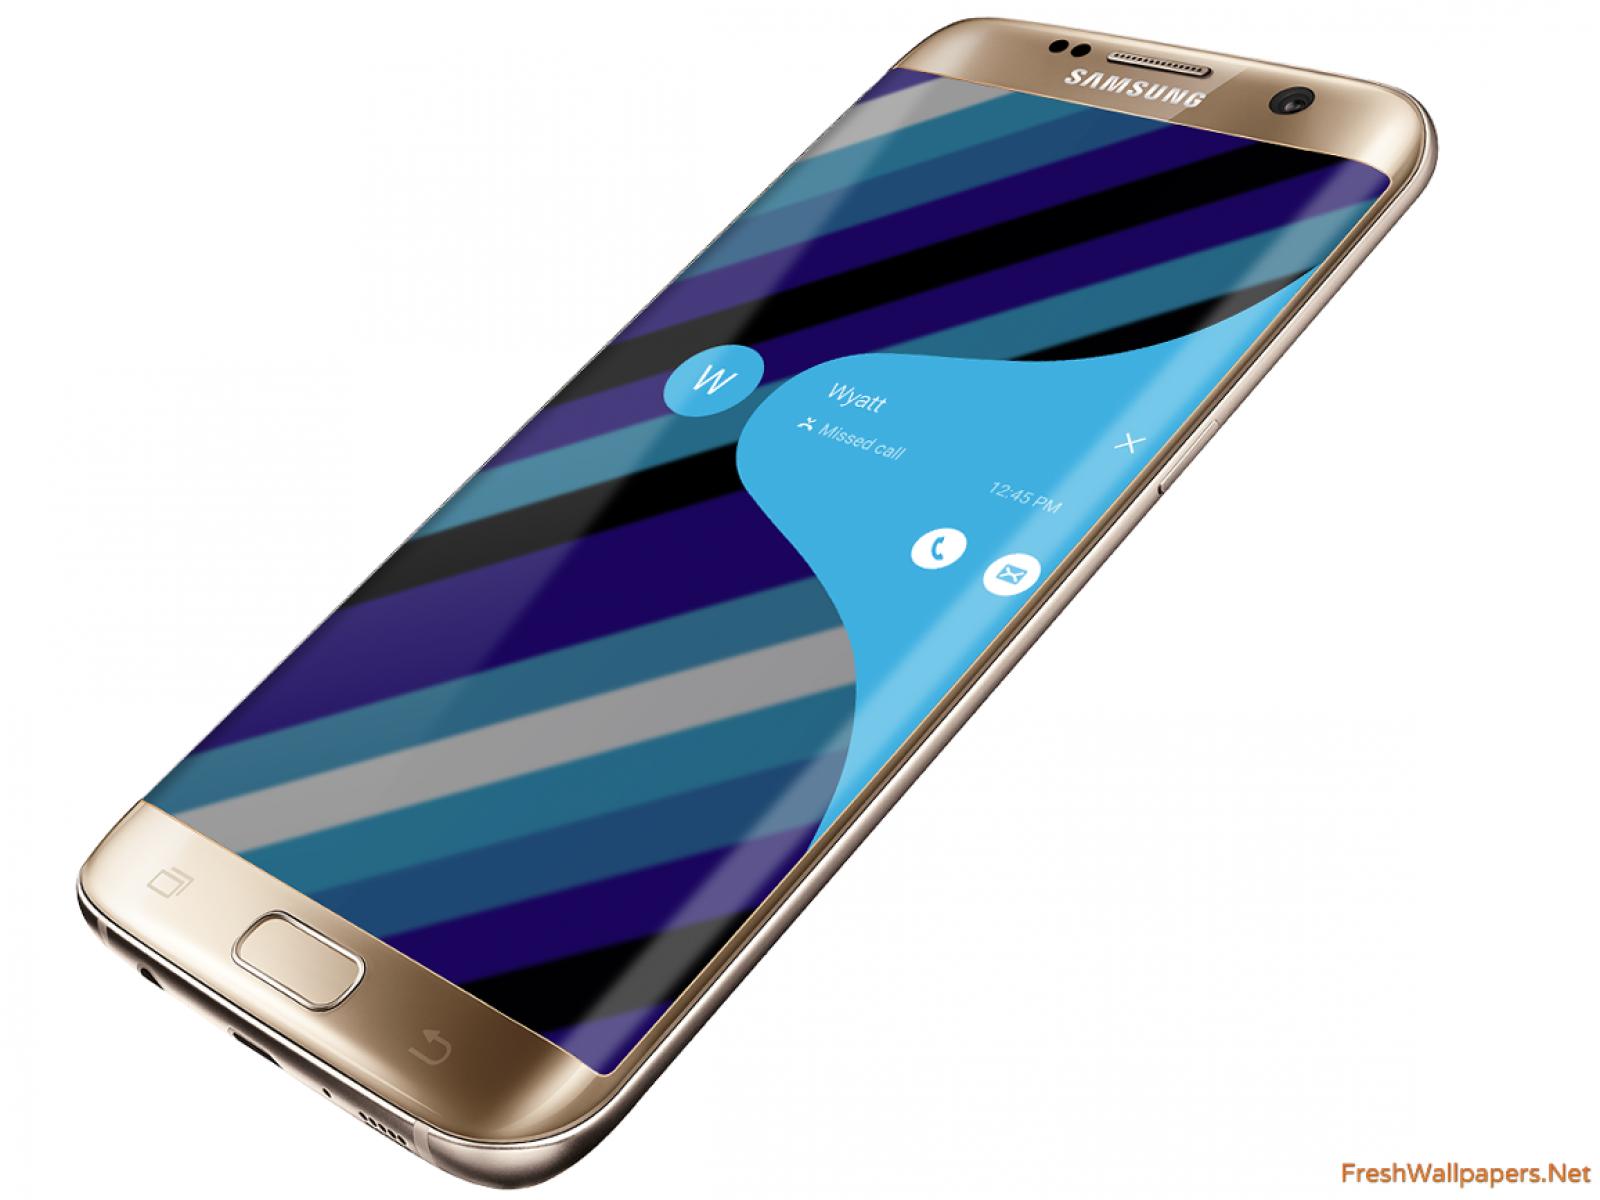 Samsung Galaxy S7 Edge Wallpaper Full Hd 1600x1200 Wallpaper Teahub Io